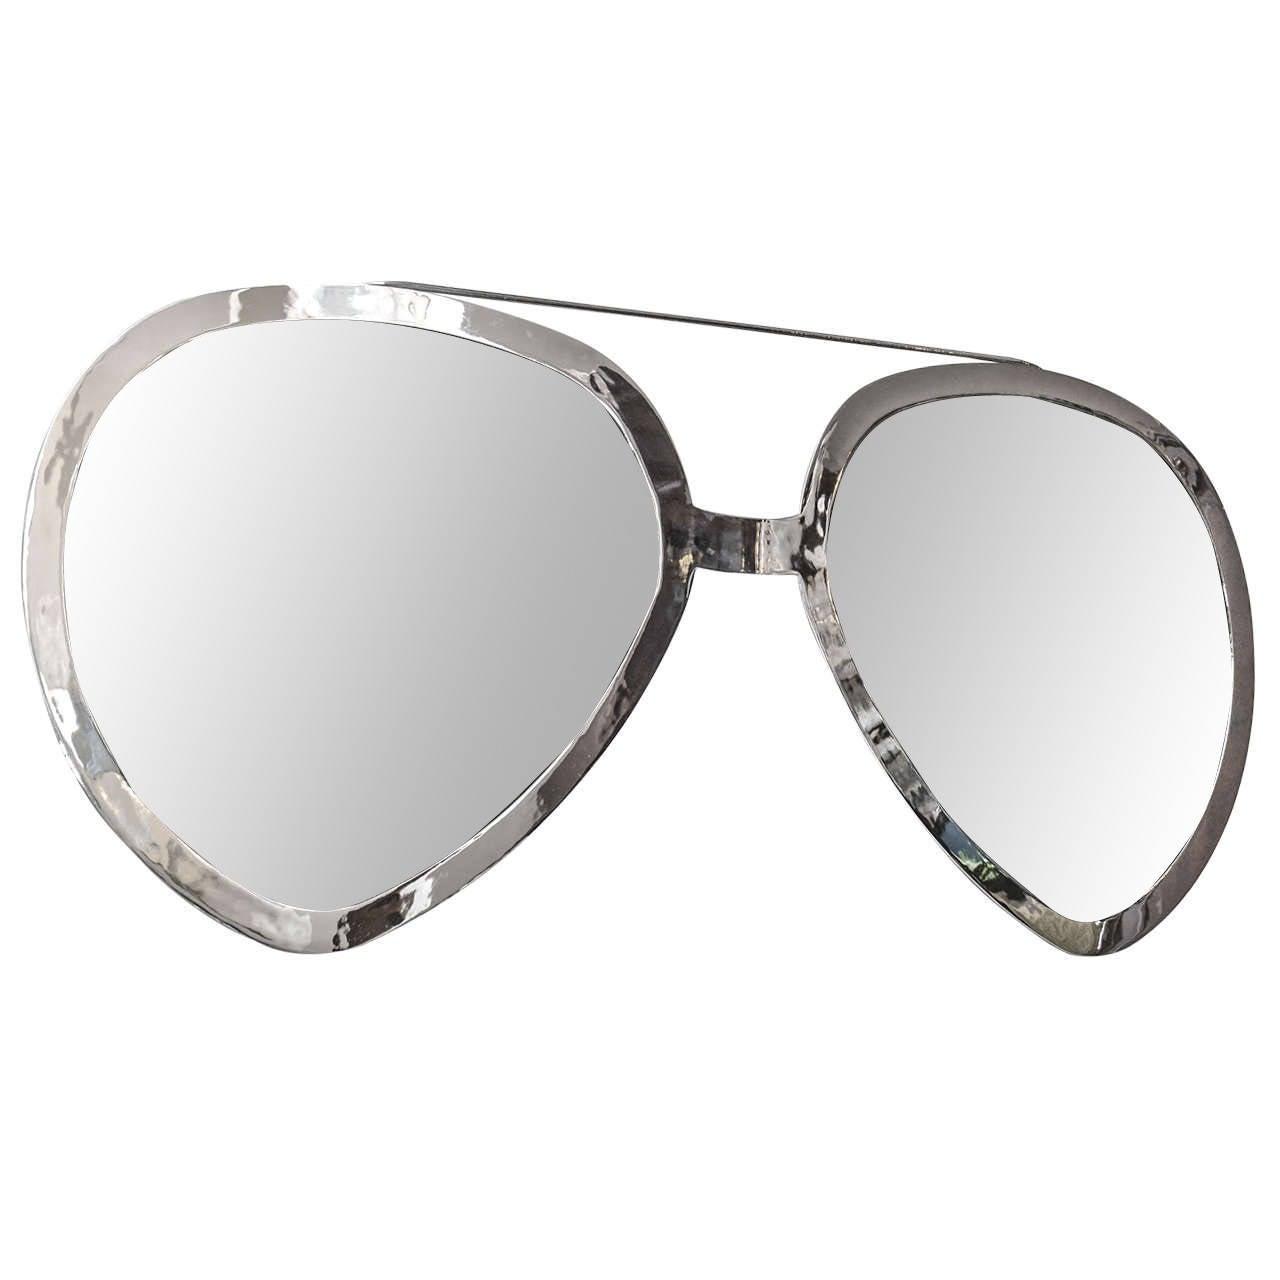 fbb361fba3 Oversized Aviator Mirror Sunglasses at 1stdibs